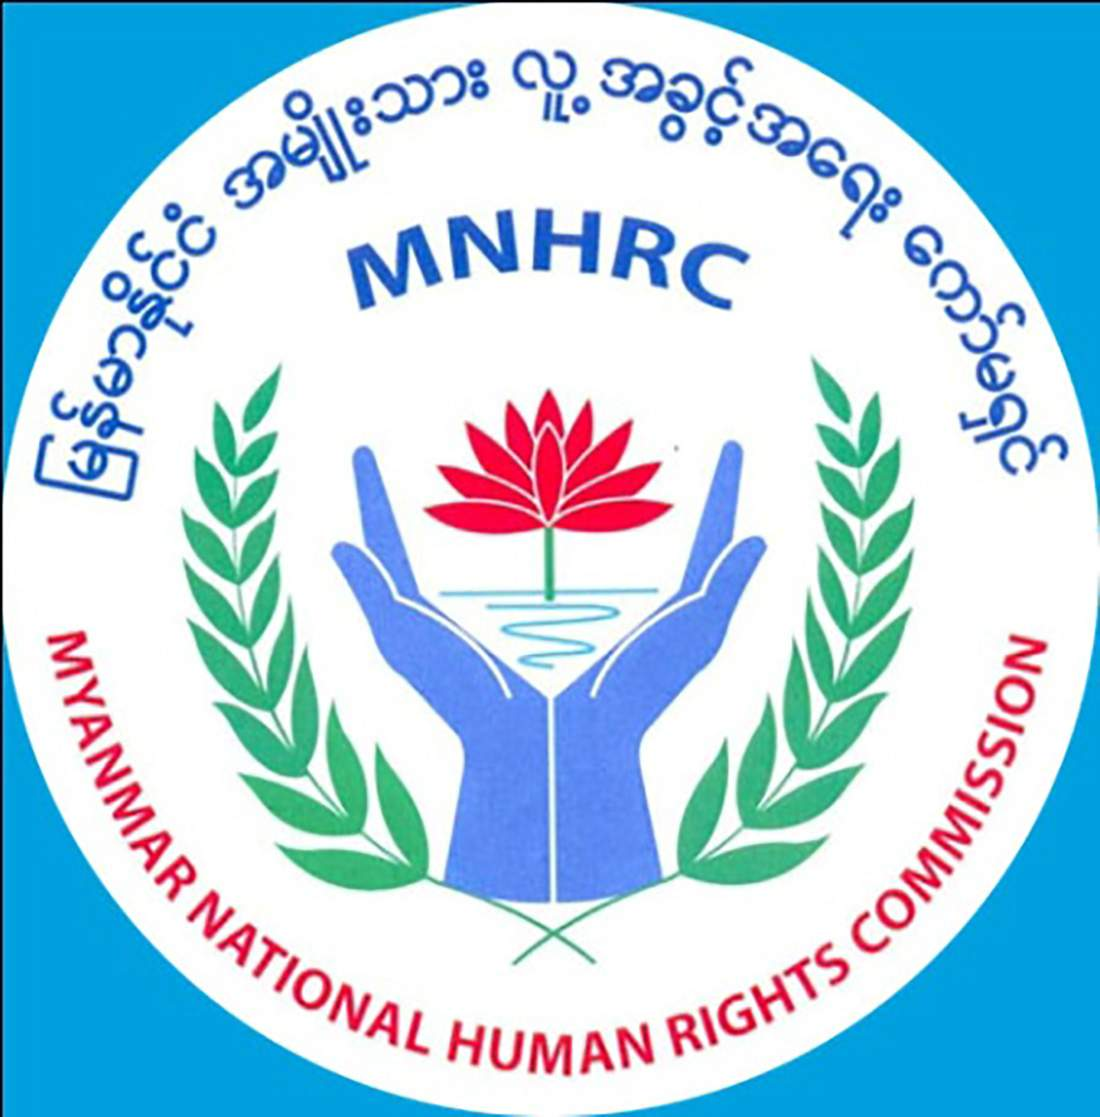 MNHRC 0